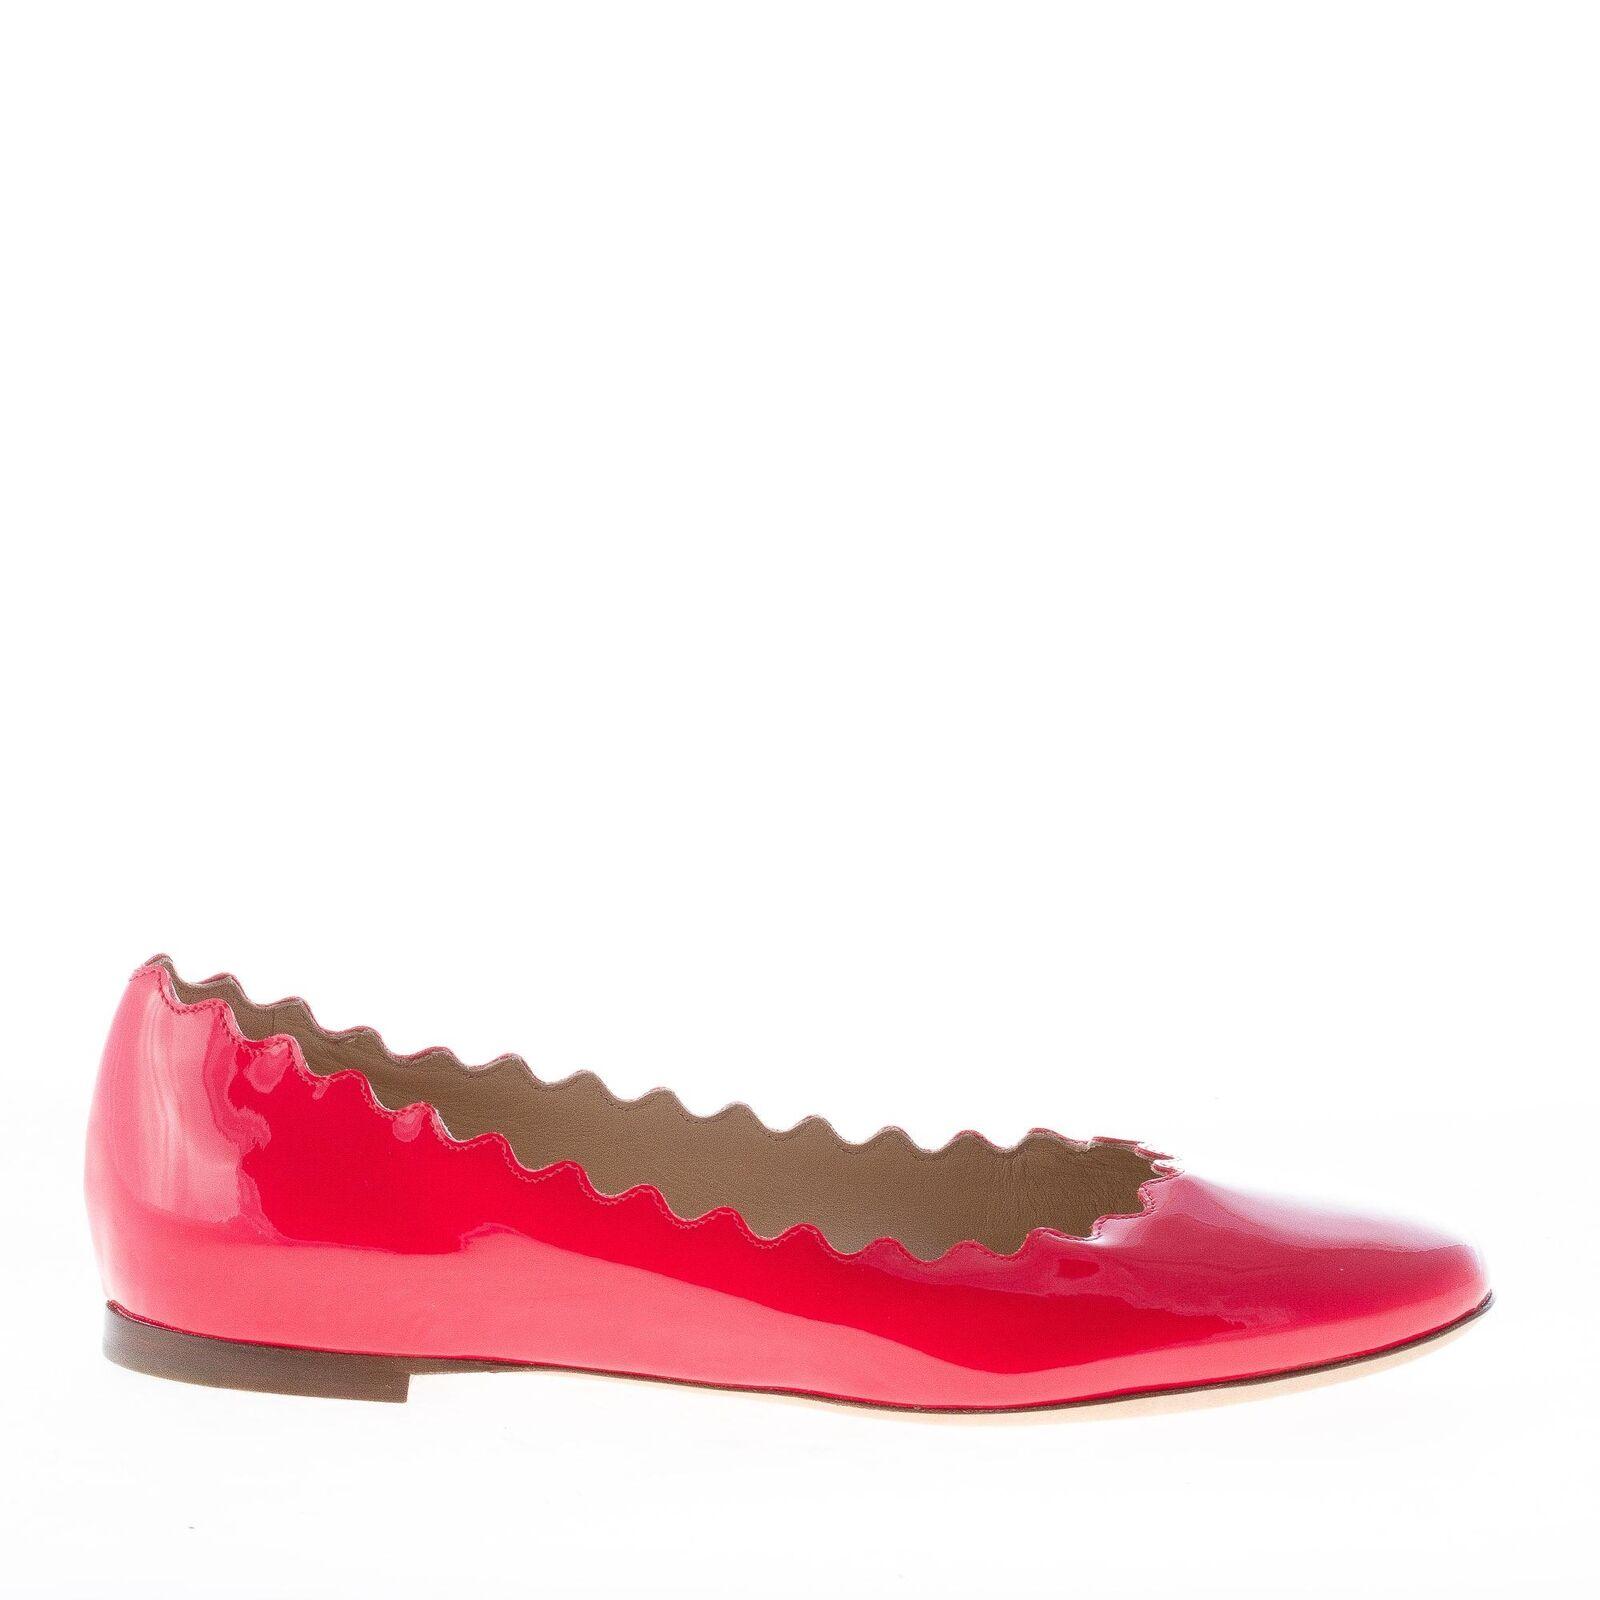 CHLOE' women shoes Lauren red patent leather ballerina scalloped edge CH24160E80